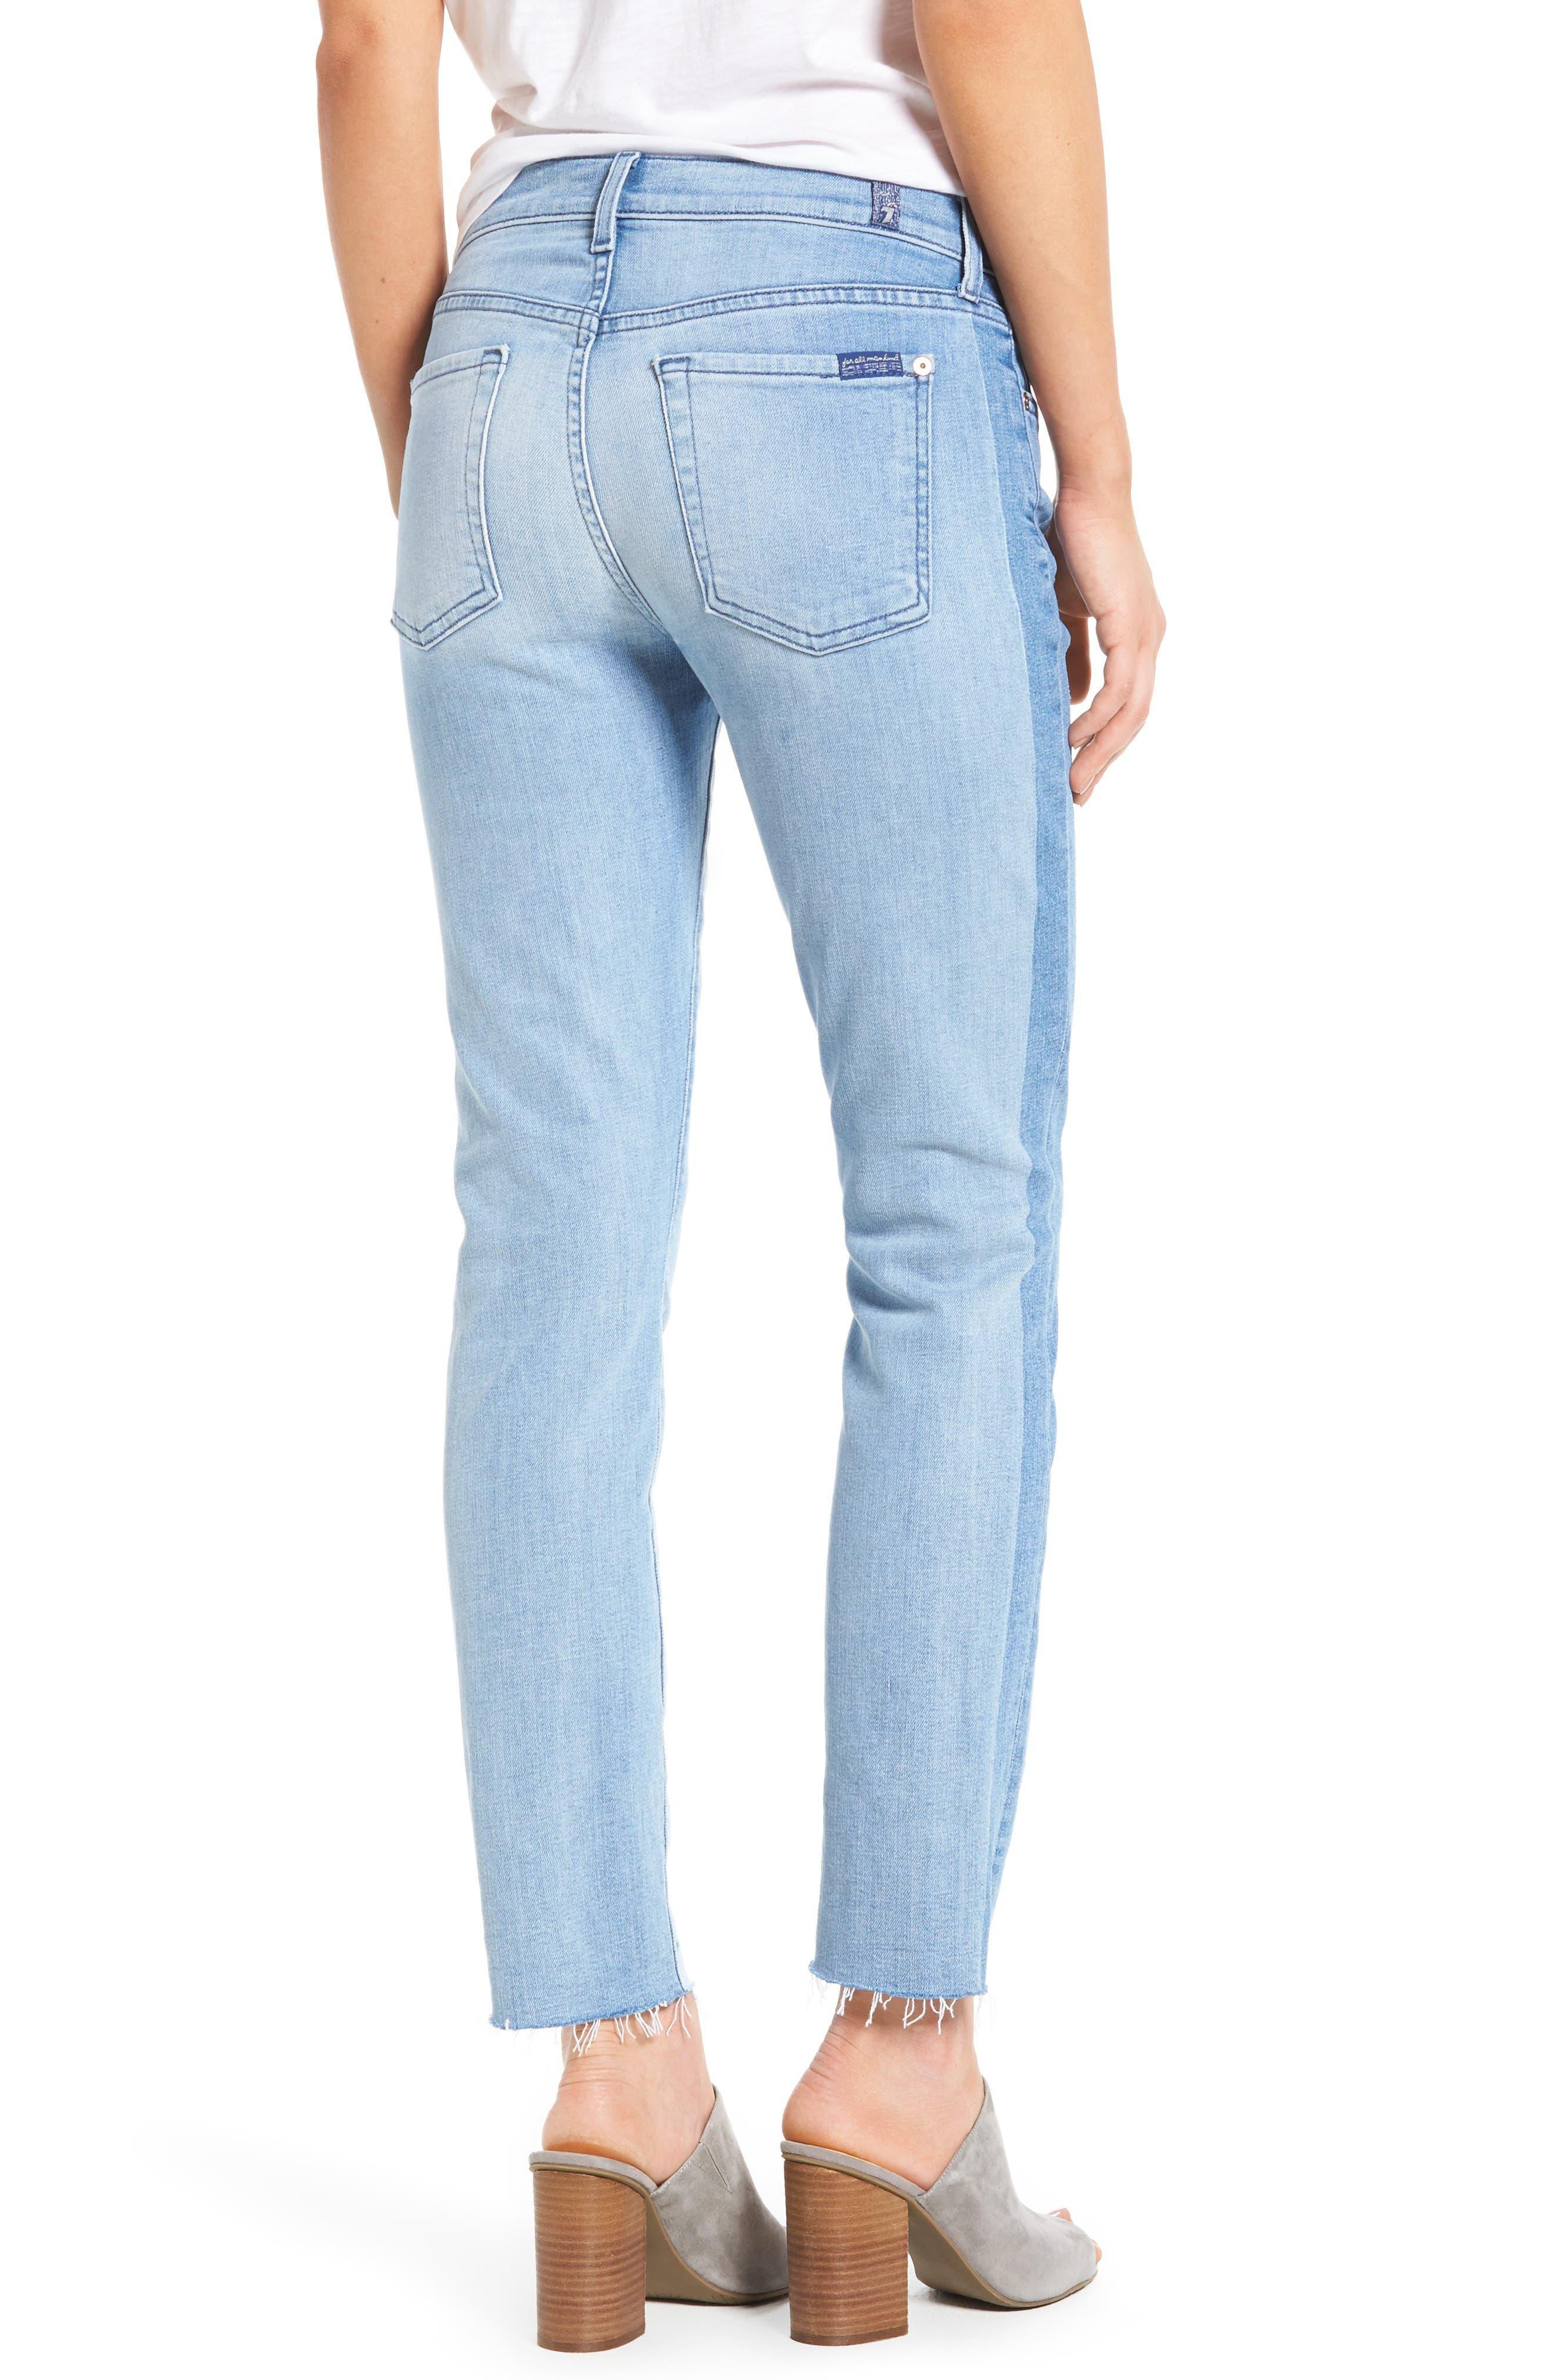 Roxanne Original Ankle Skinny Jeans,                             Alternate thumbnail 2, color,